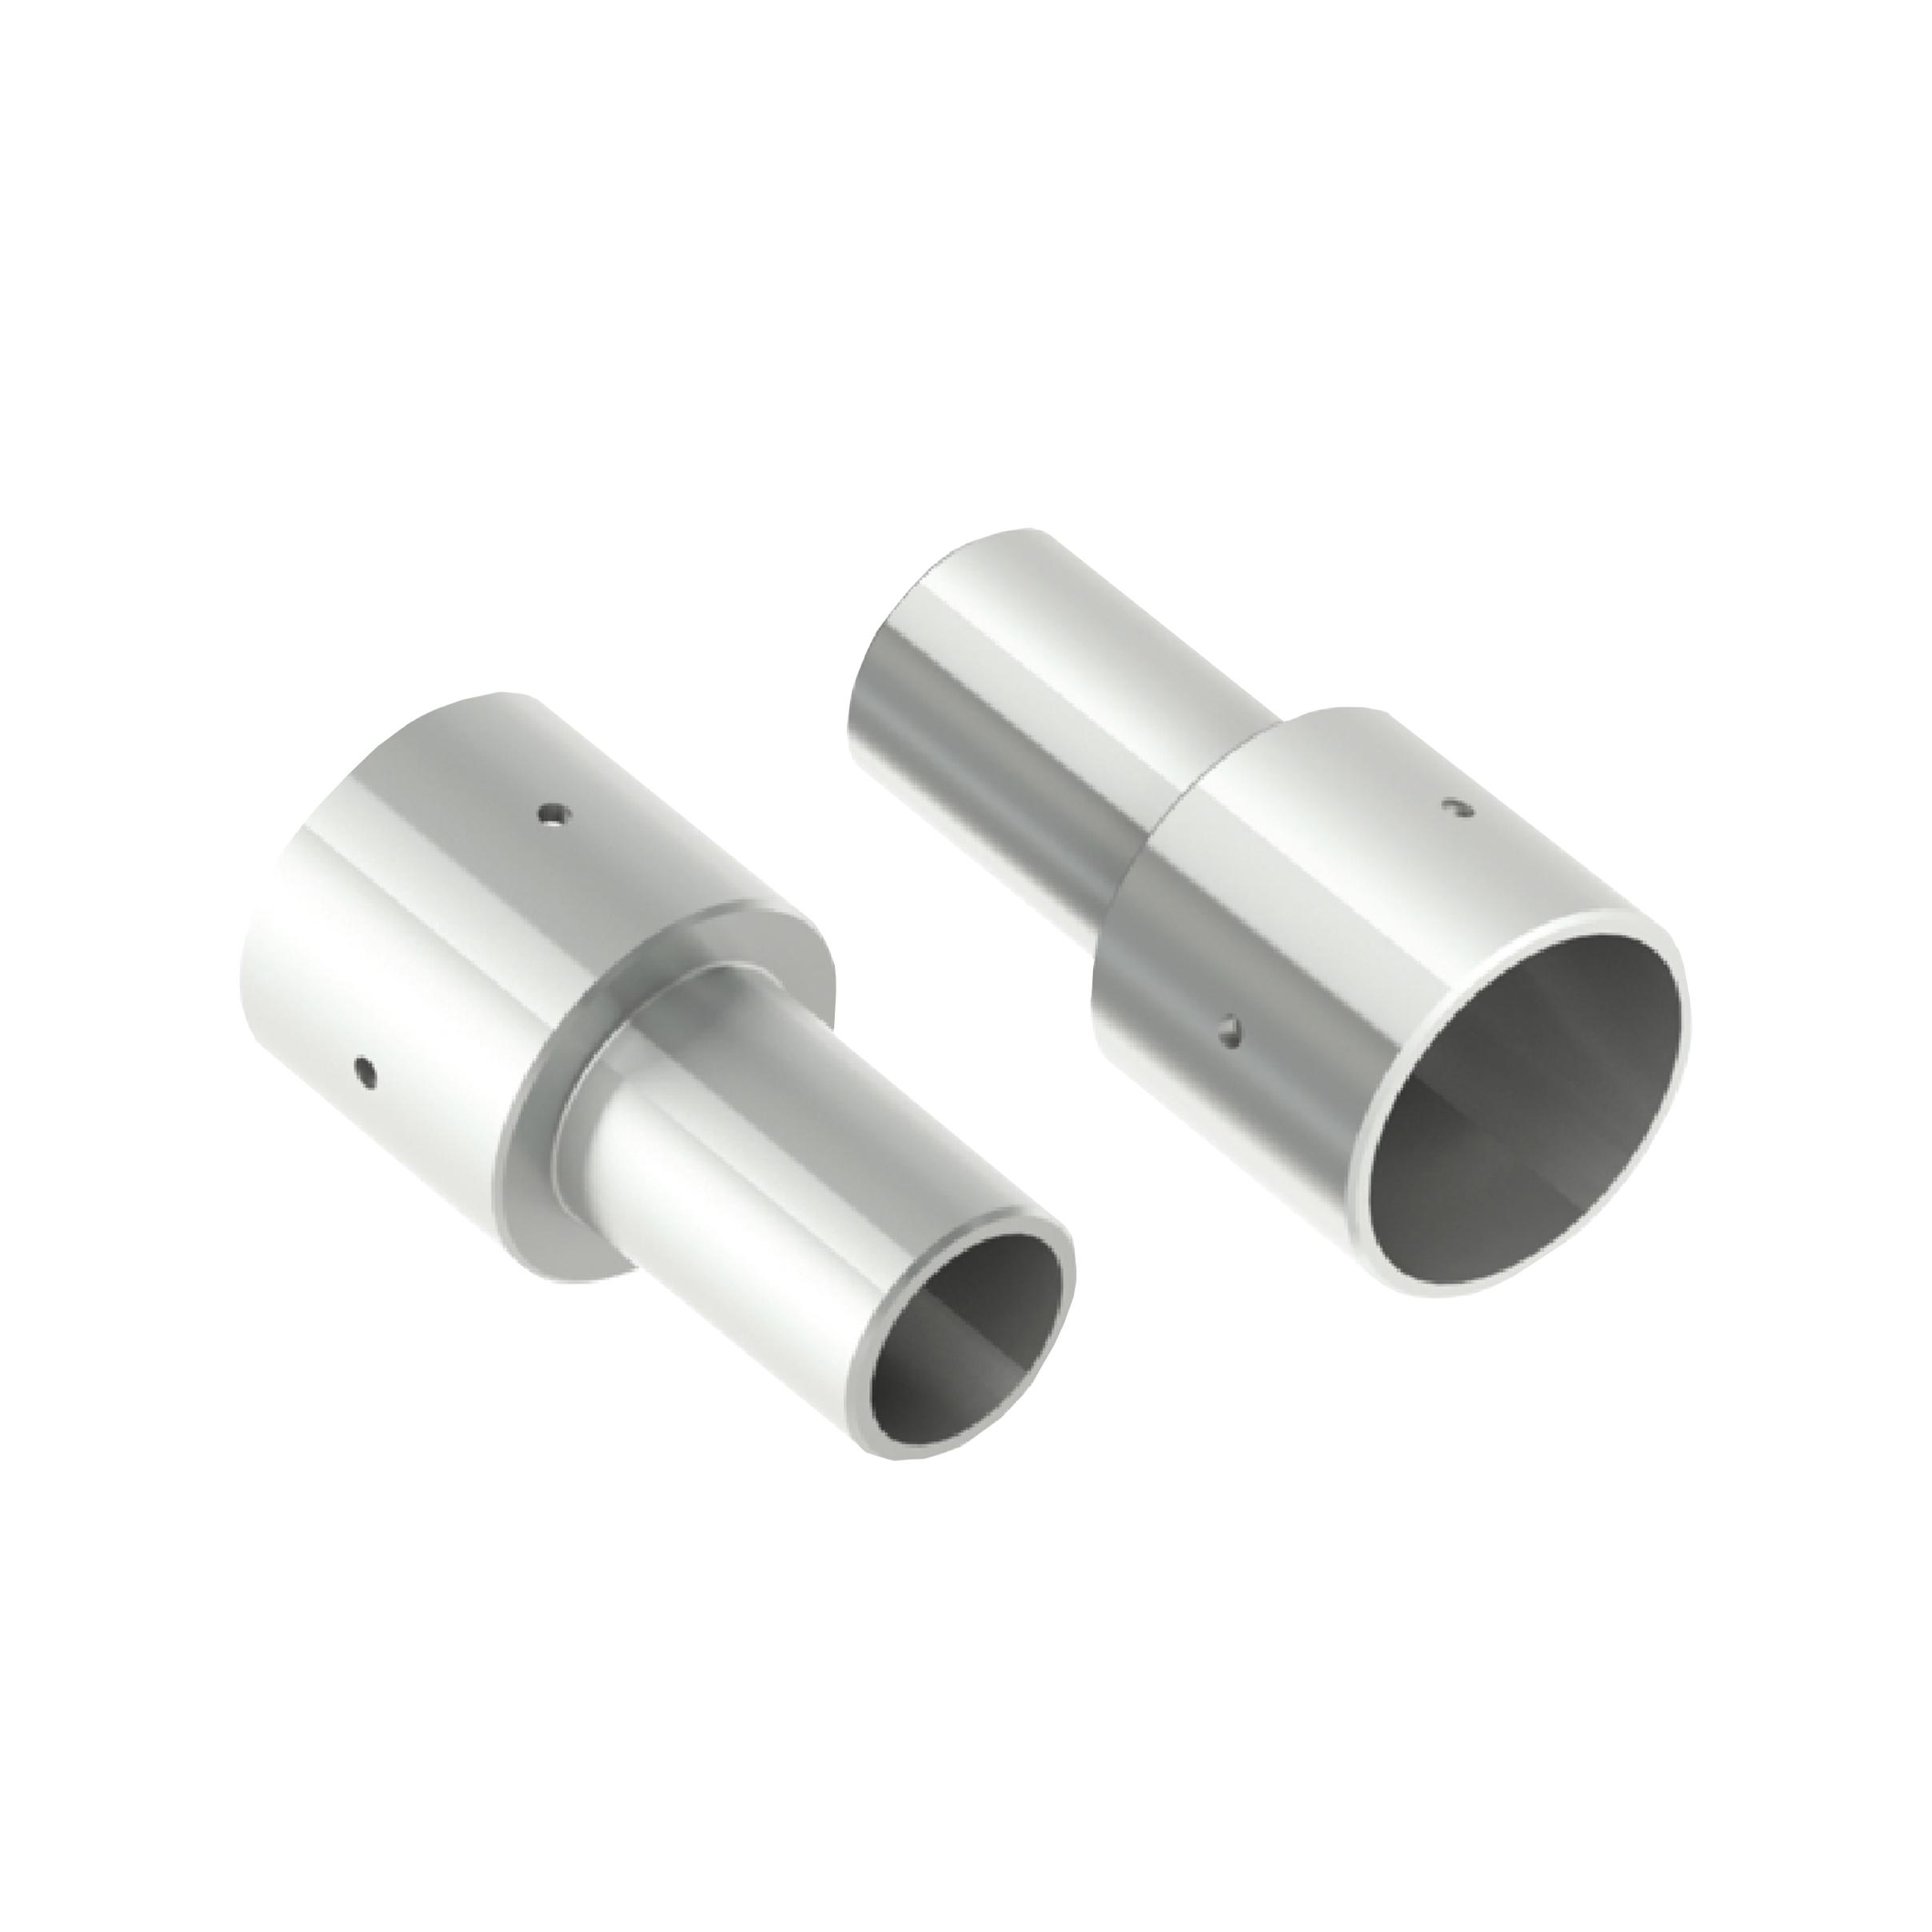 1 Stk RUBINIO LED Adapter 60 auf 76 mm, grau LIG1517817